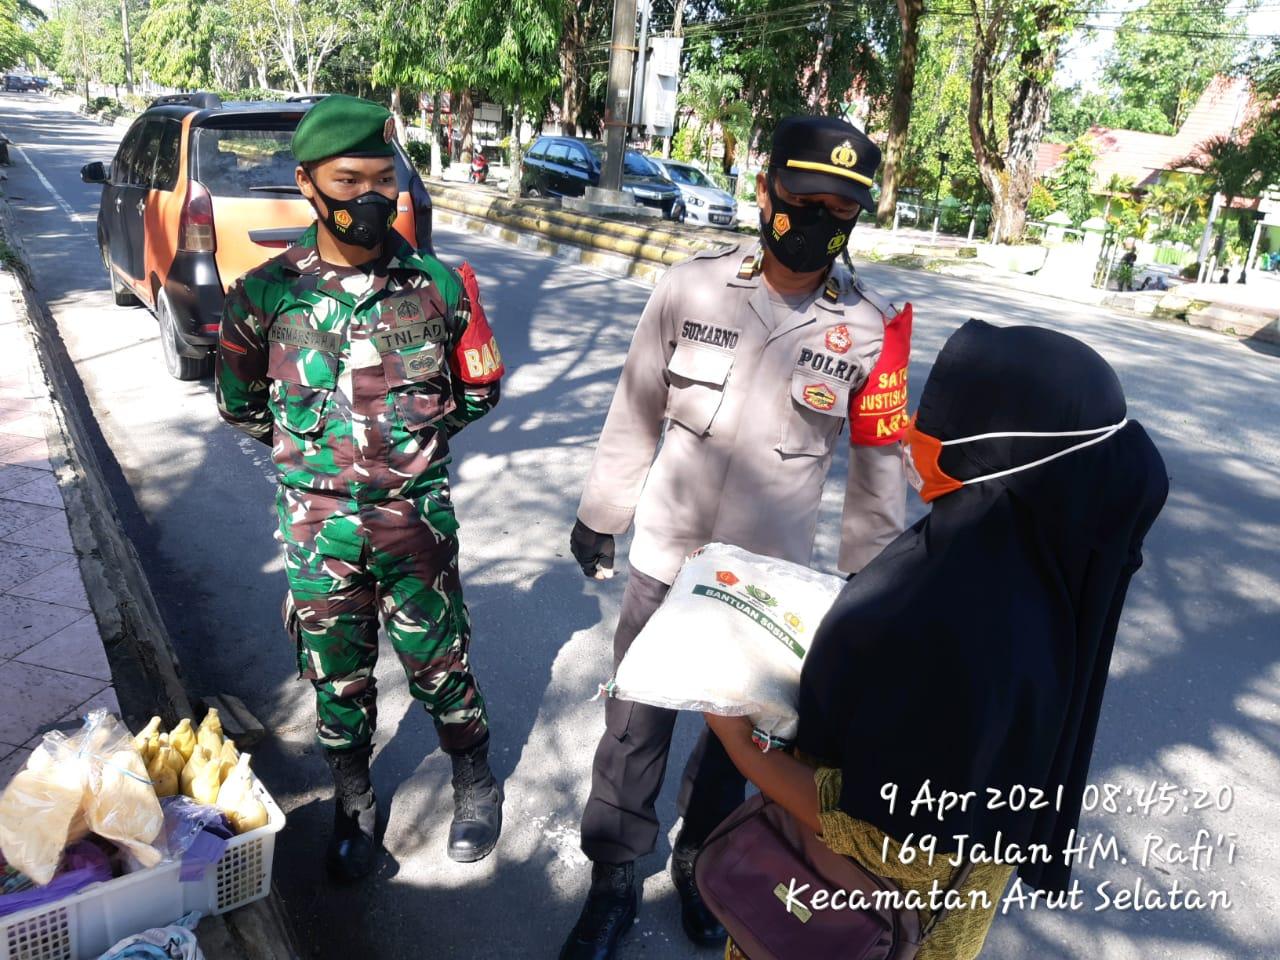 Jum'at Berkah Polsek Arsel Bersama TNI Salurkan Bantuan Sembako Kepada Warga Seputaran Kota P Bun